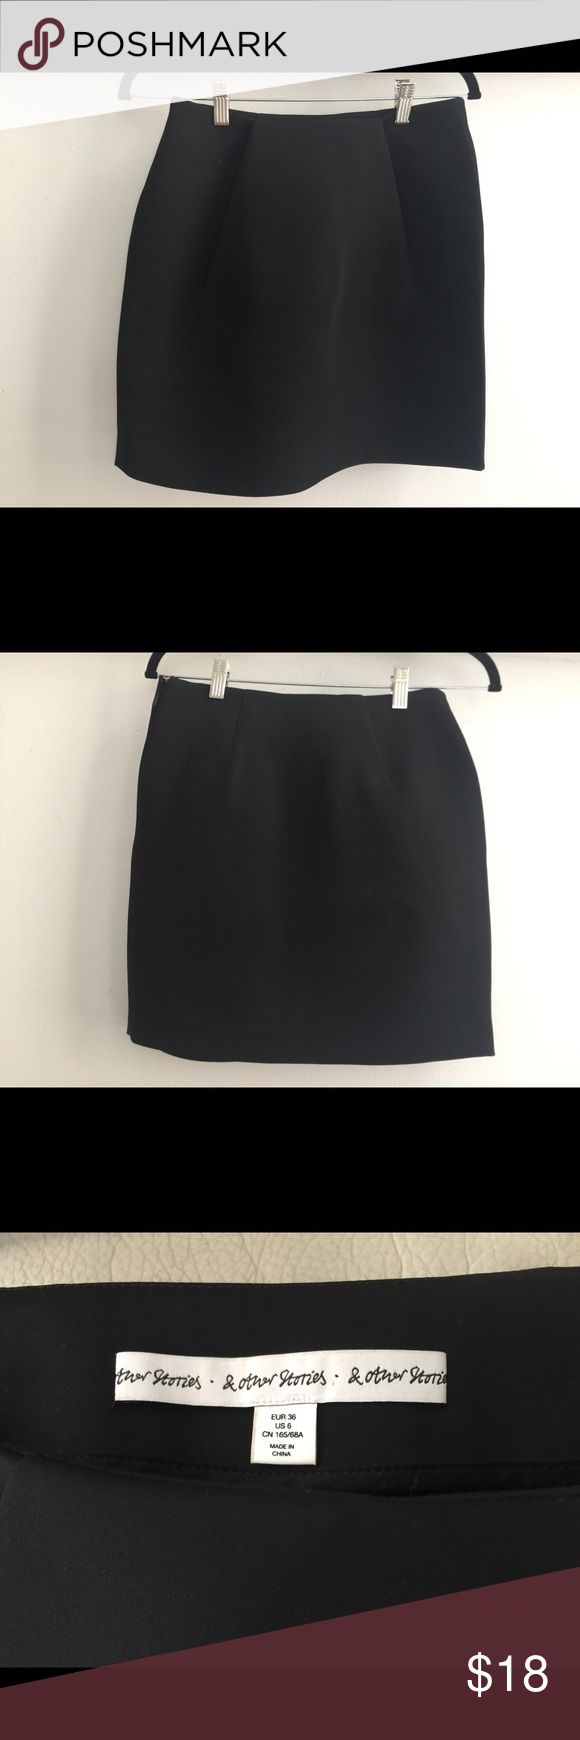 Mini skirt New other stories Skirts Mini